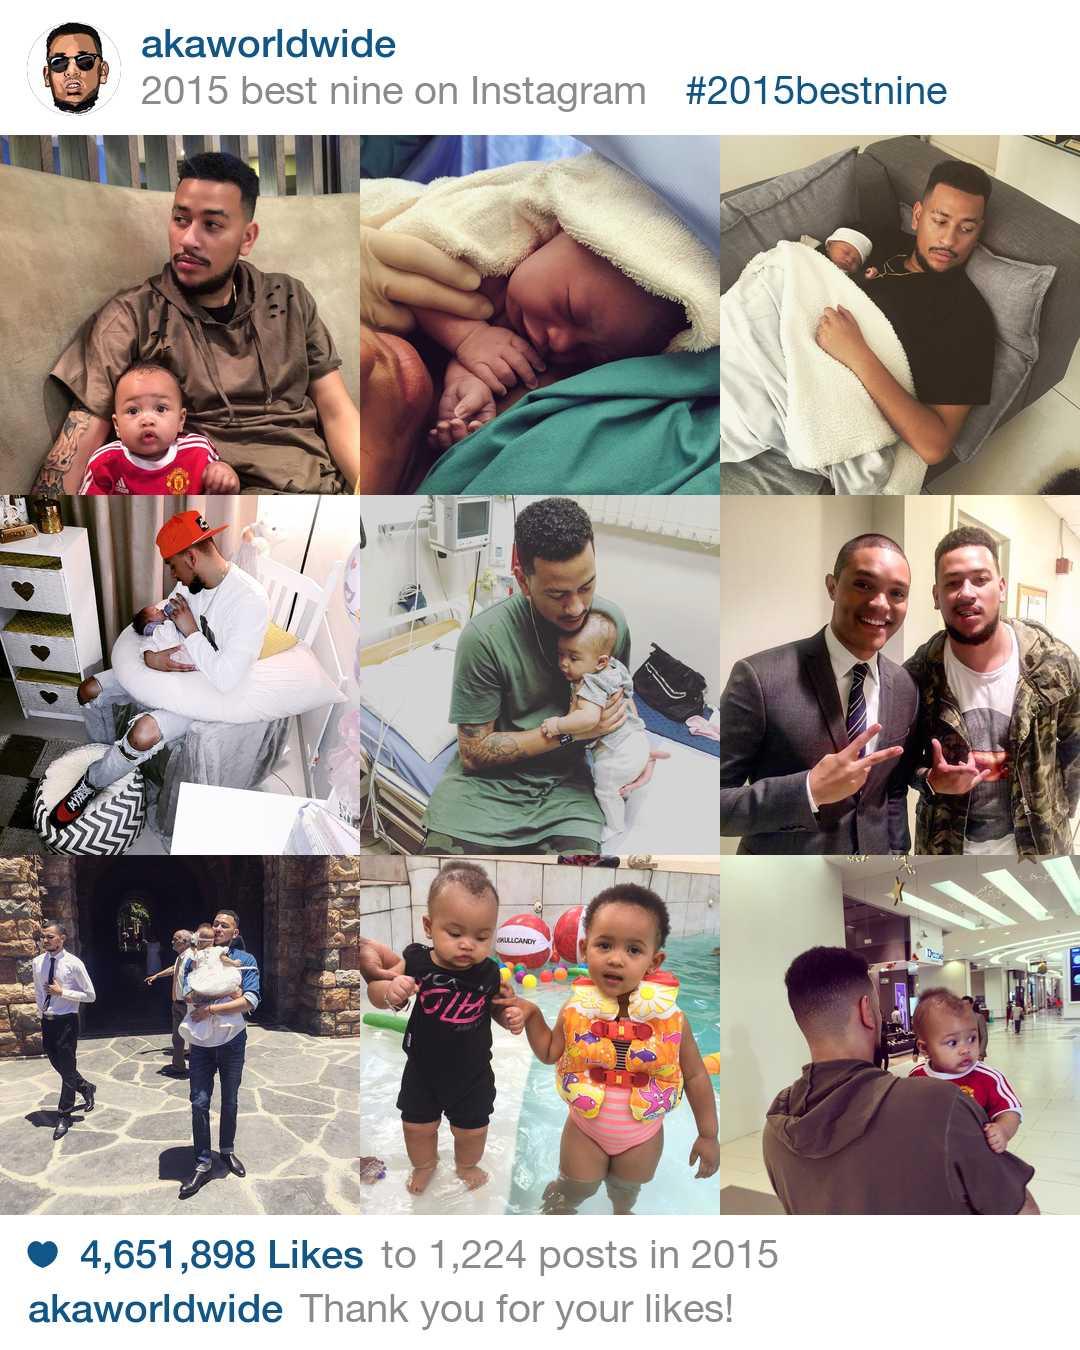 Top Nine Instagram Posts >> aka world wide #2015BestNine on Instagram - The Edge Search